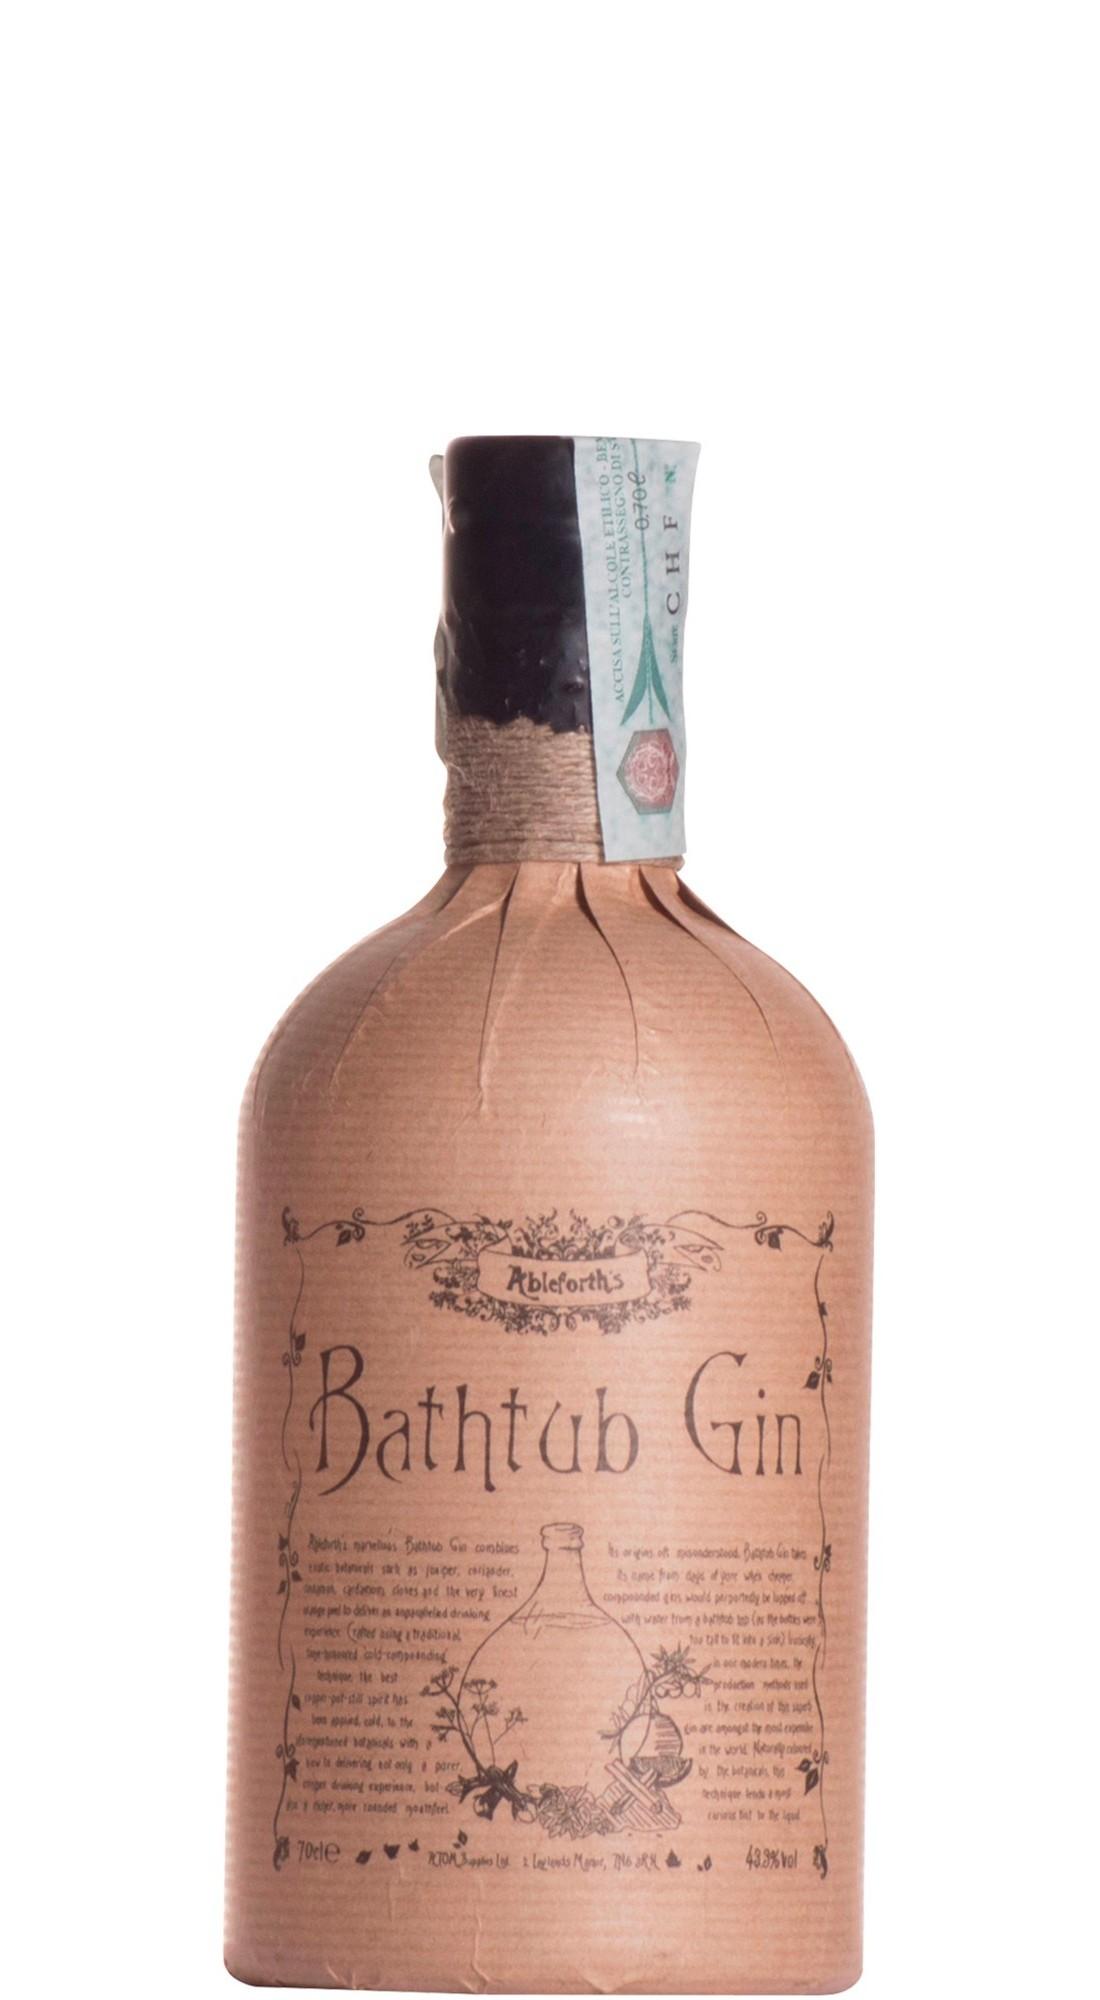 Ableforths Bathub Gin 43 3 70 Cl